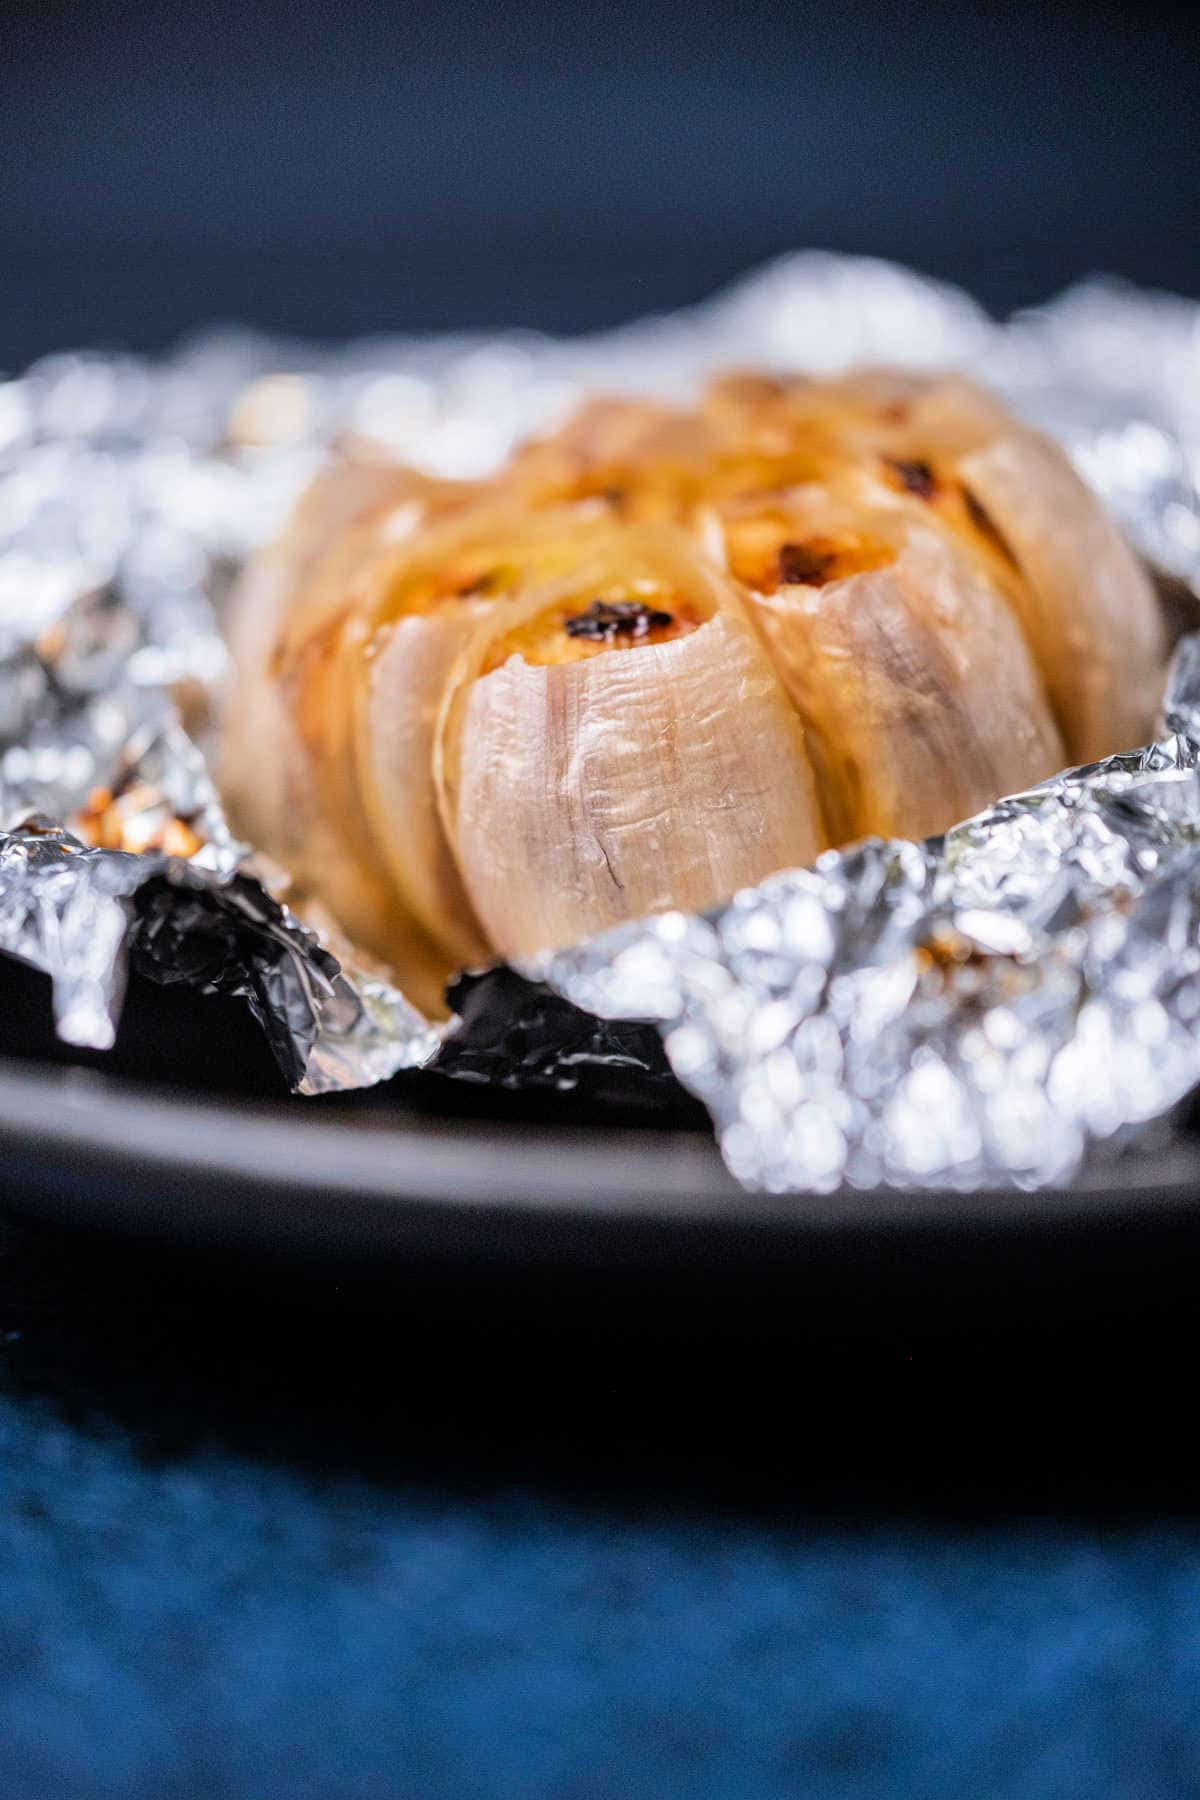 Whole roasted garlic on a black plate.